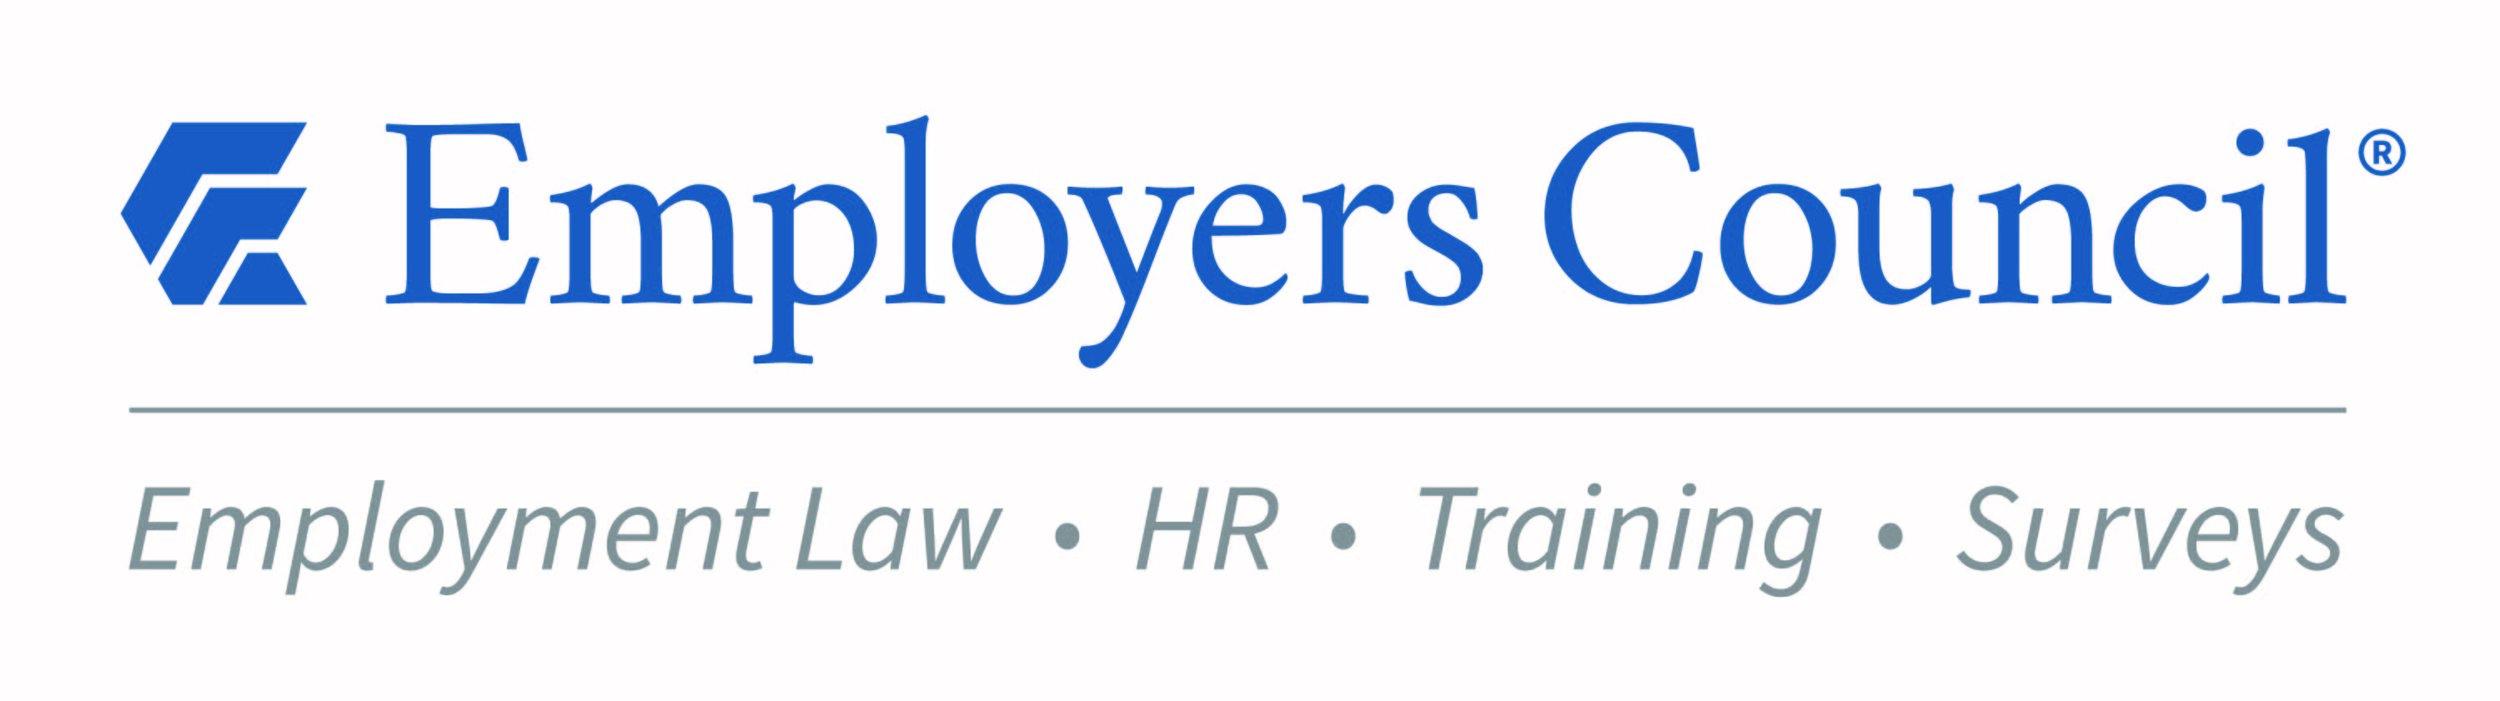 Employers Council.jpg